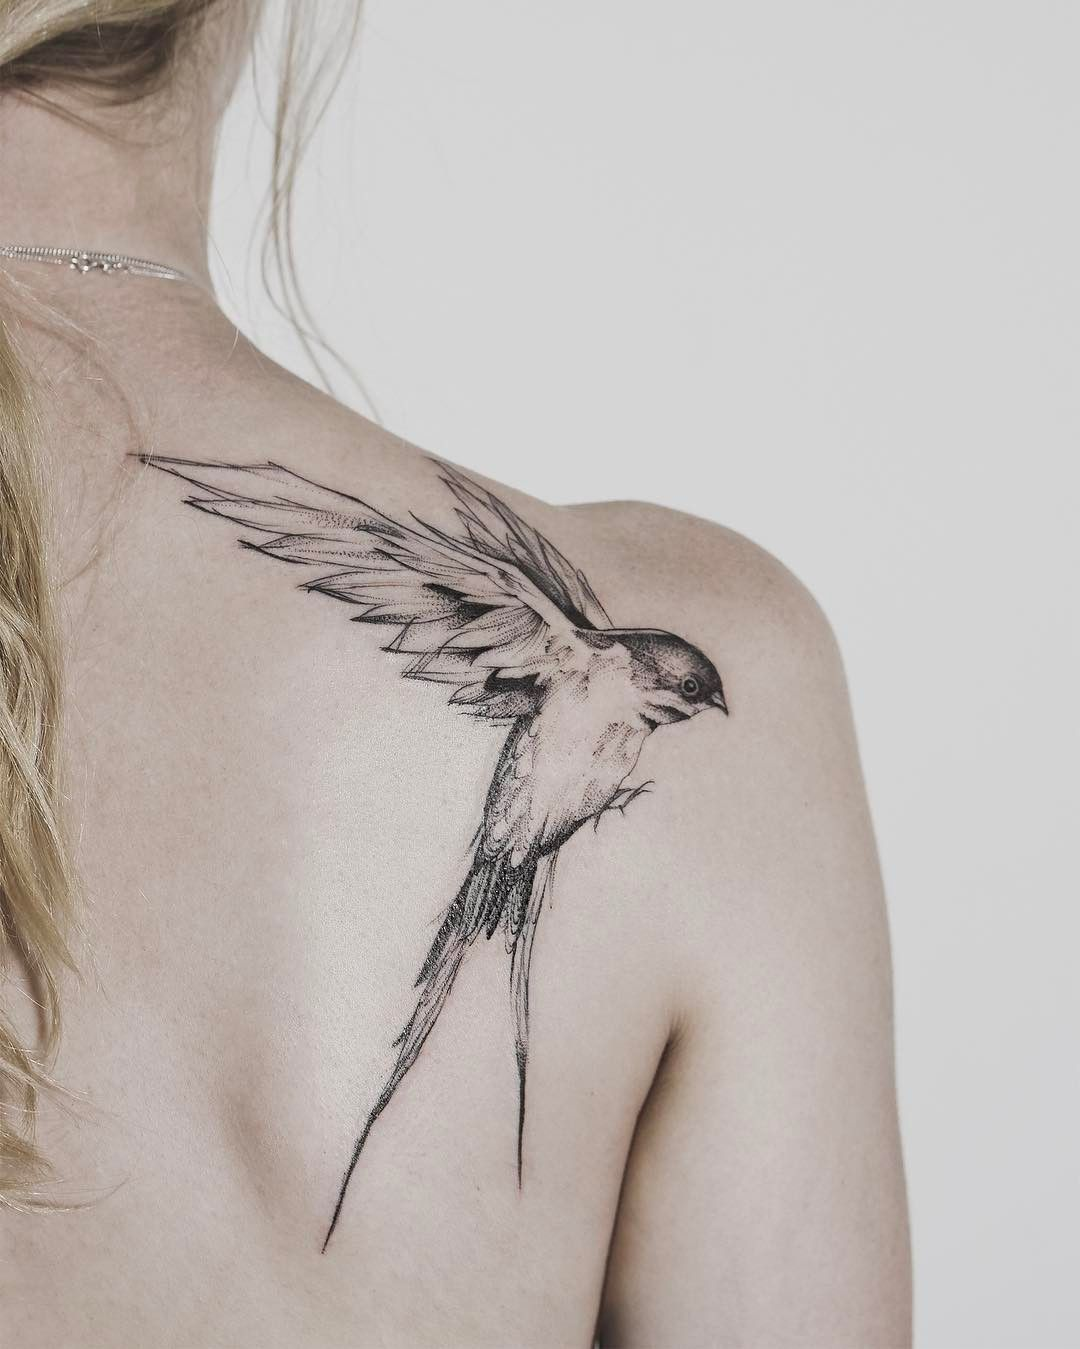 Bird Tattoos Meaning And Symbolism The Wild Tattoo Random3